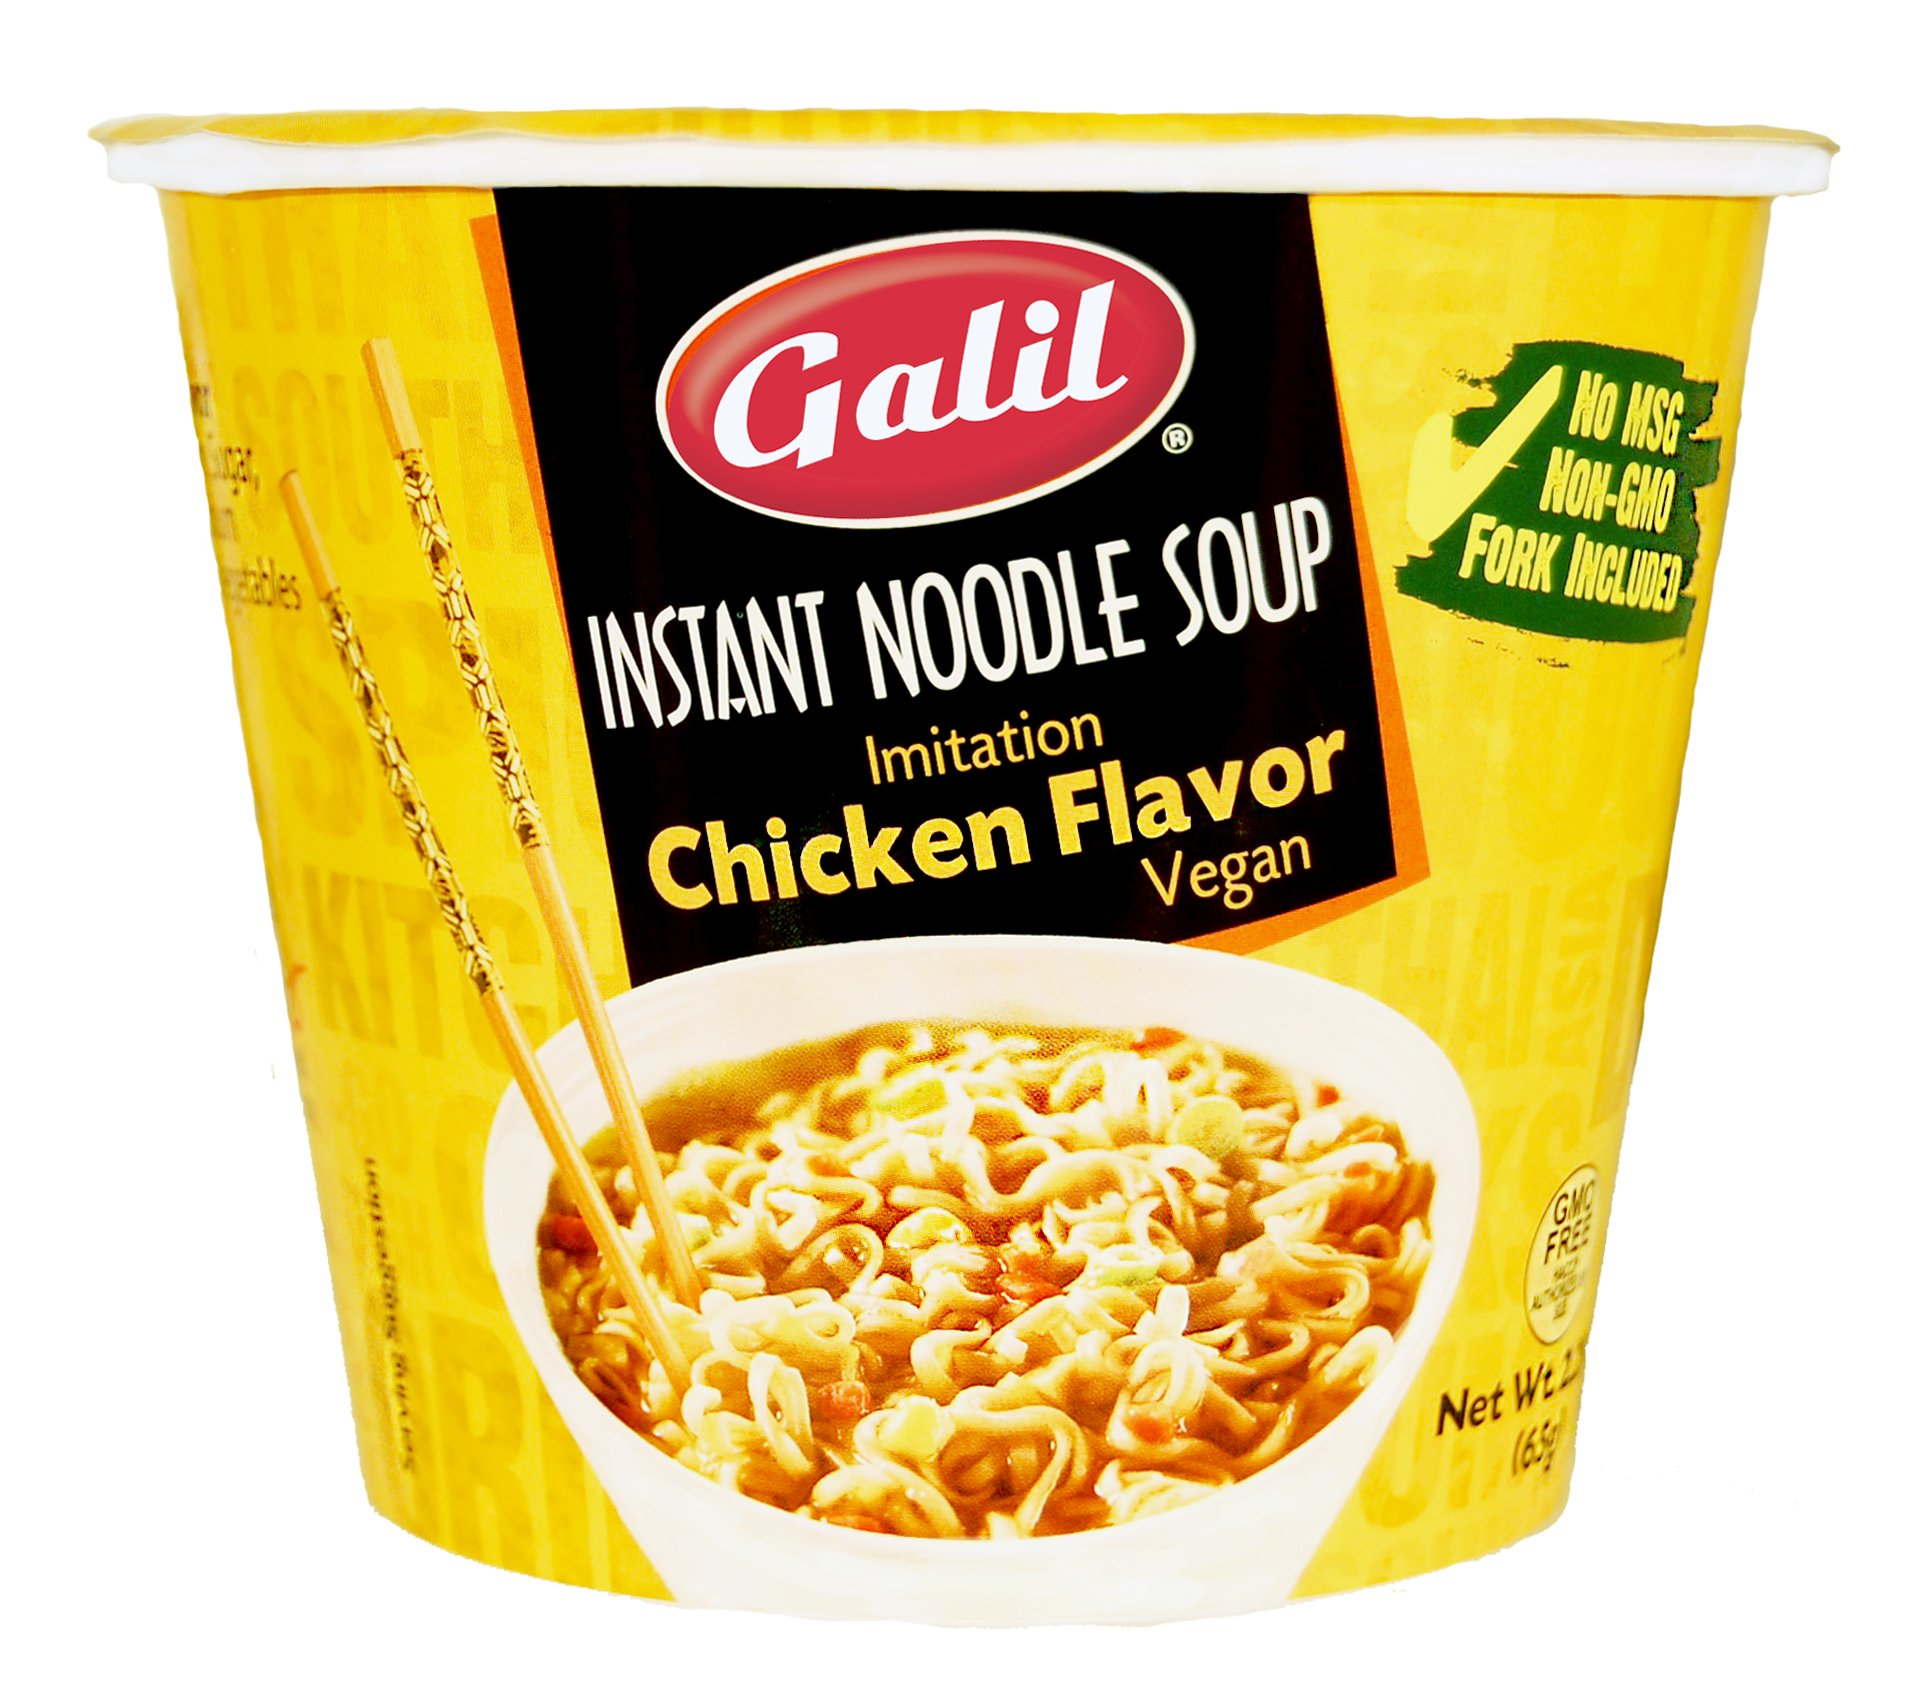 Amazon.com : Galil Instant Vegan Beef Noodle Soup, Non GMO